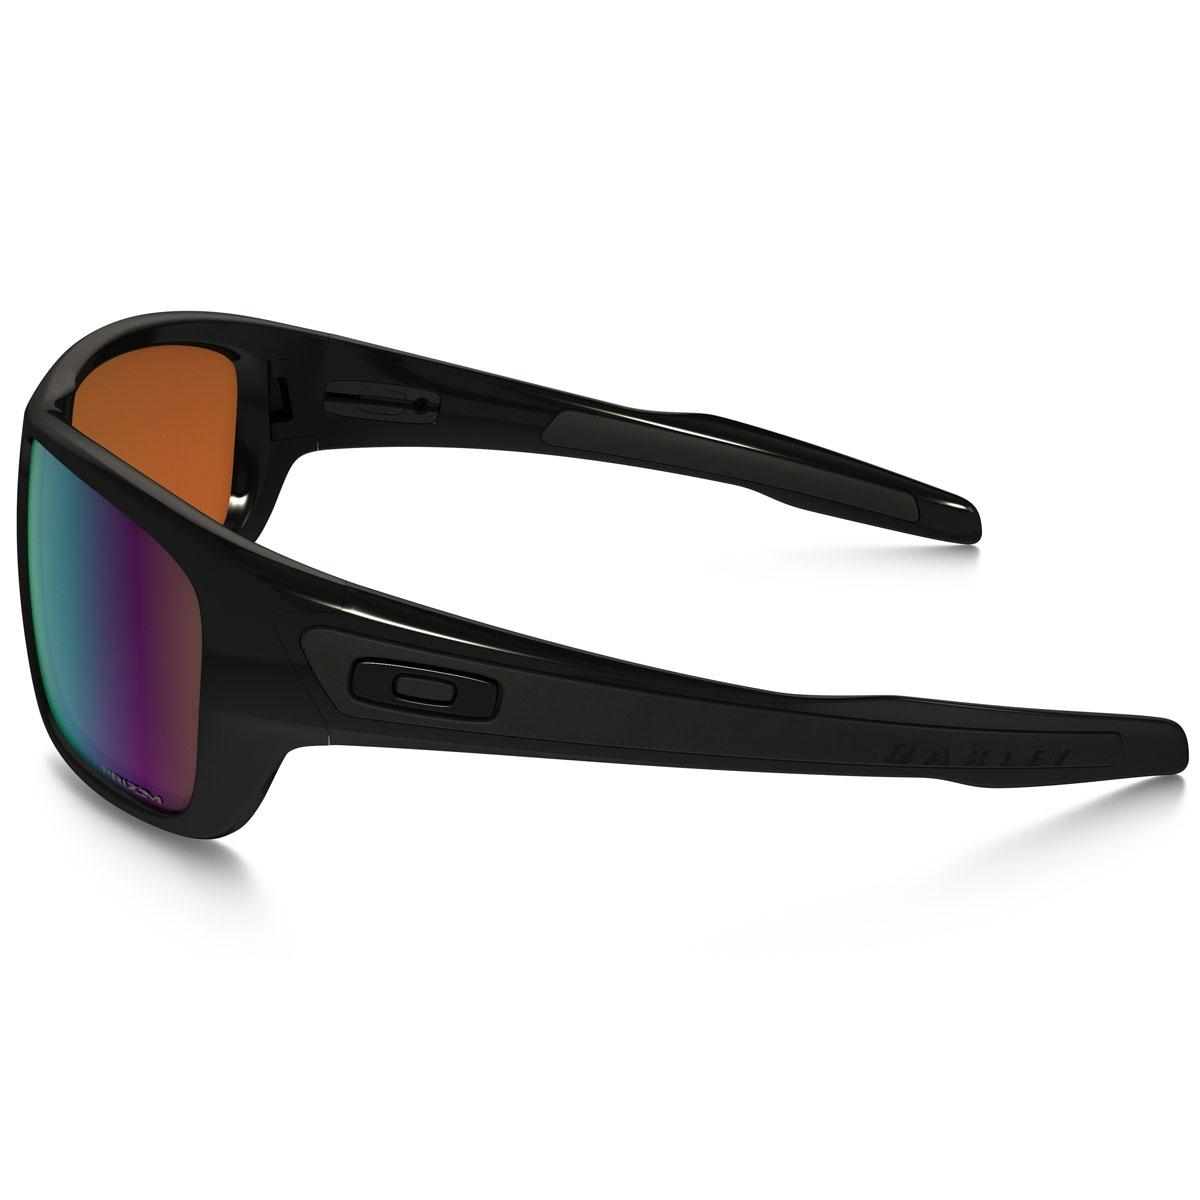 d42ff5b3ce ... Image of Oakley Turbine Sunglasses - Polished Black   Prizm Shallow  Water Polarized